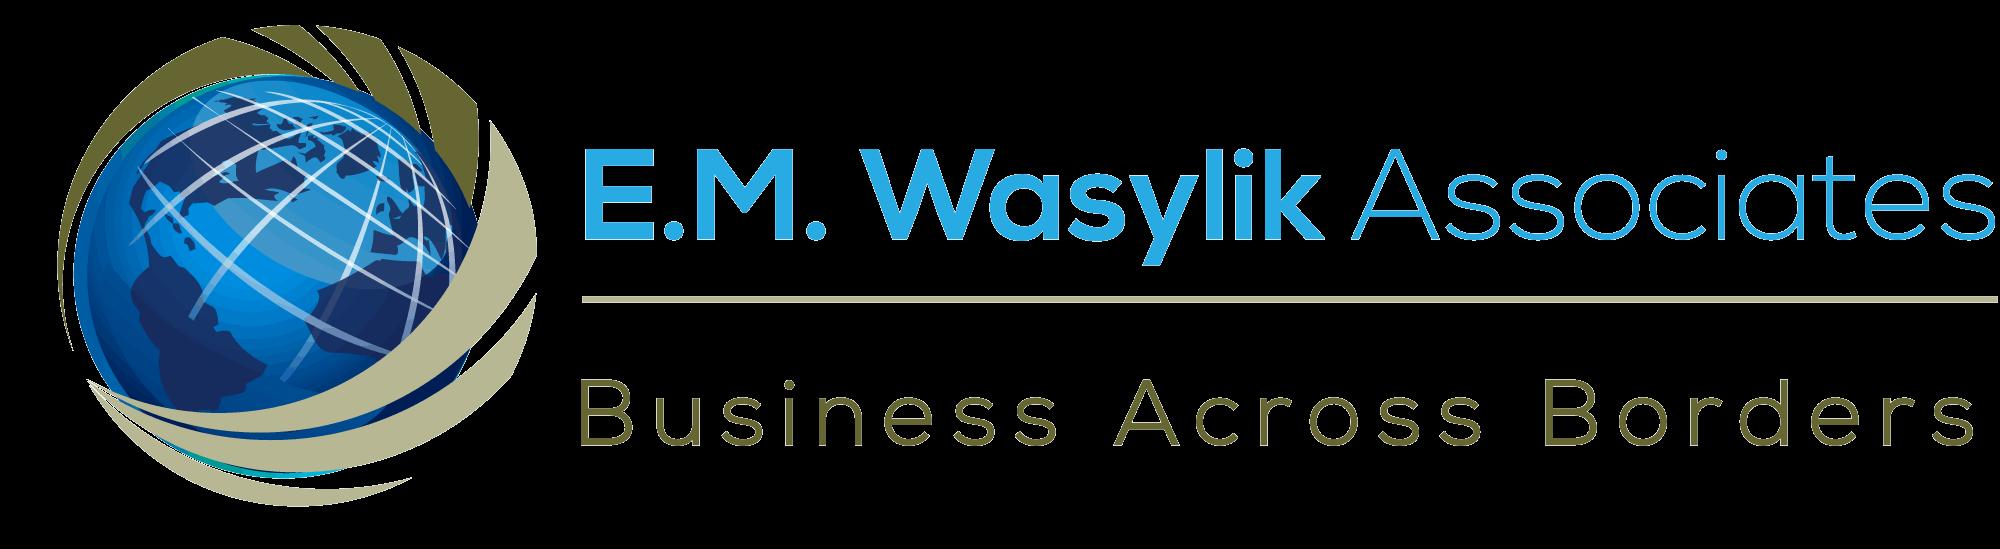 E.M. Wasylik Associates